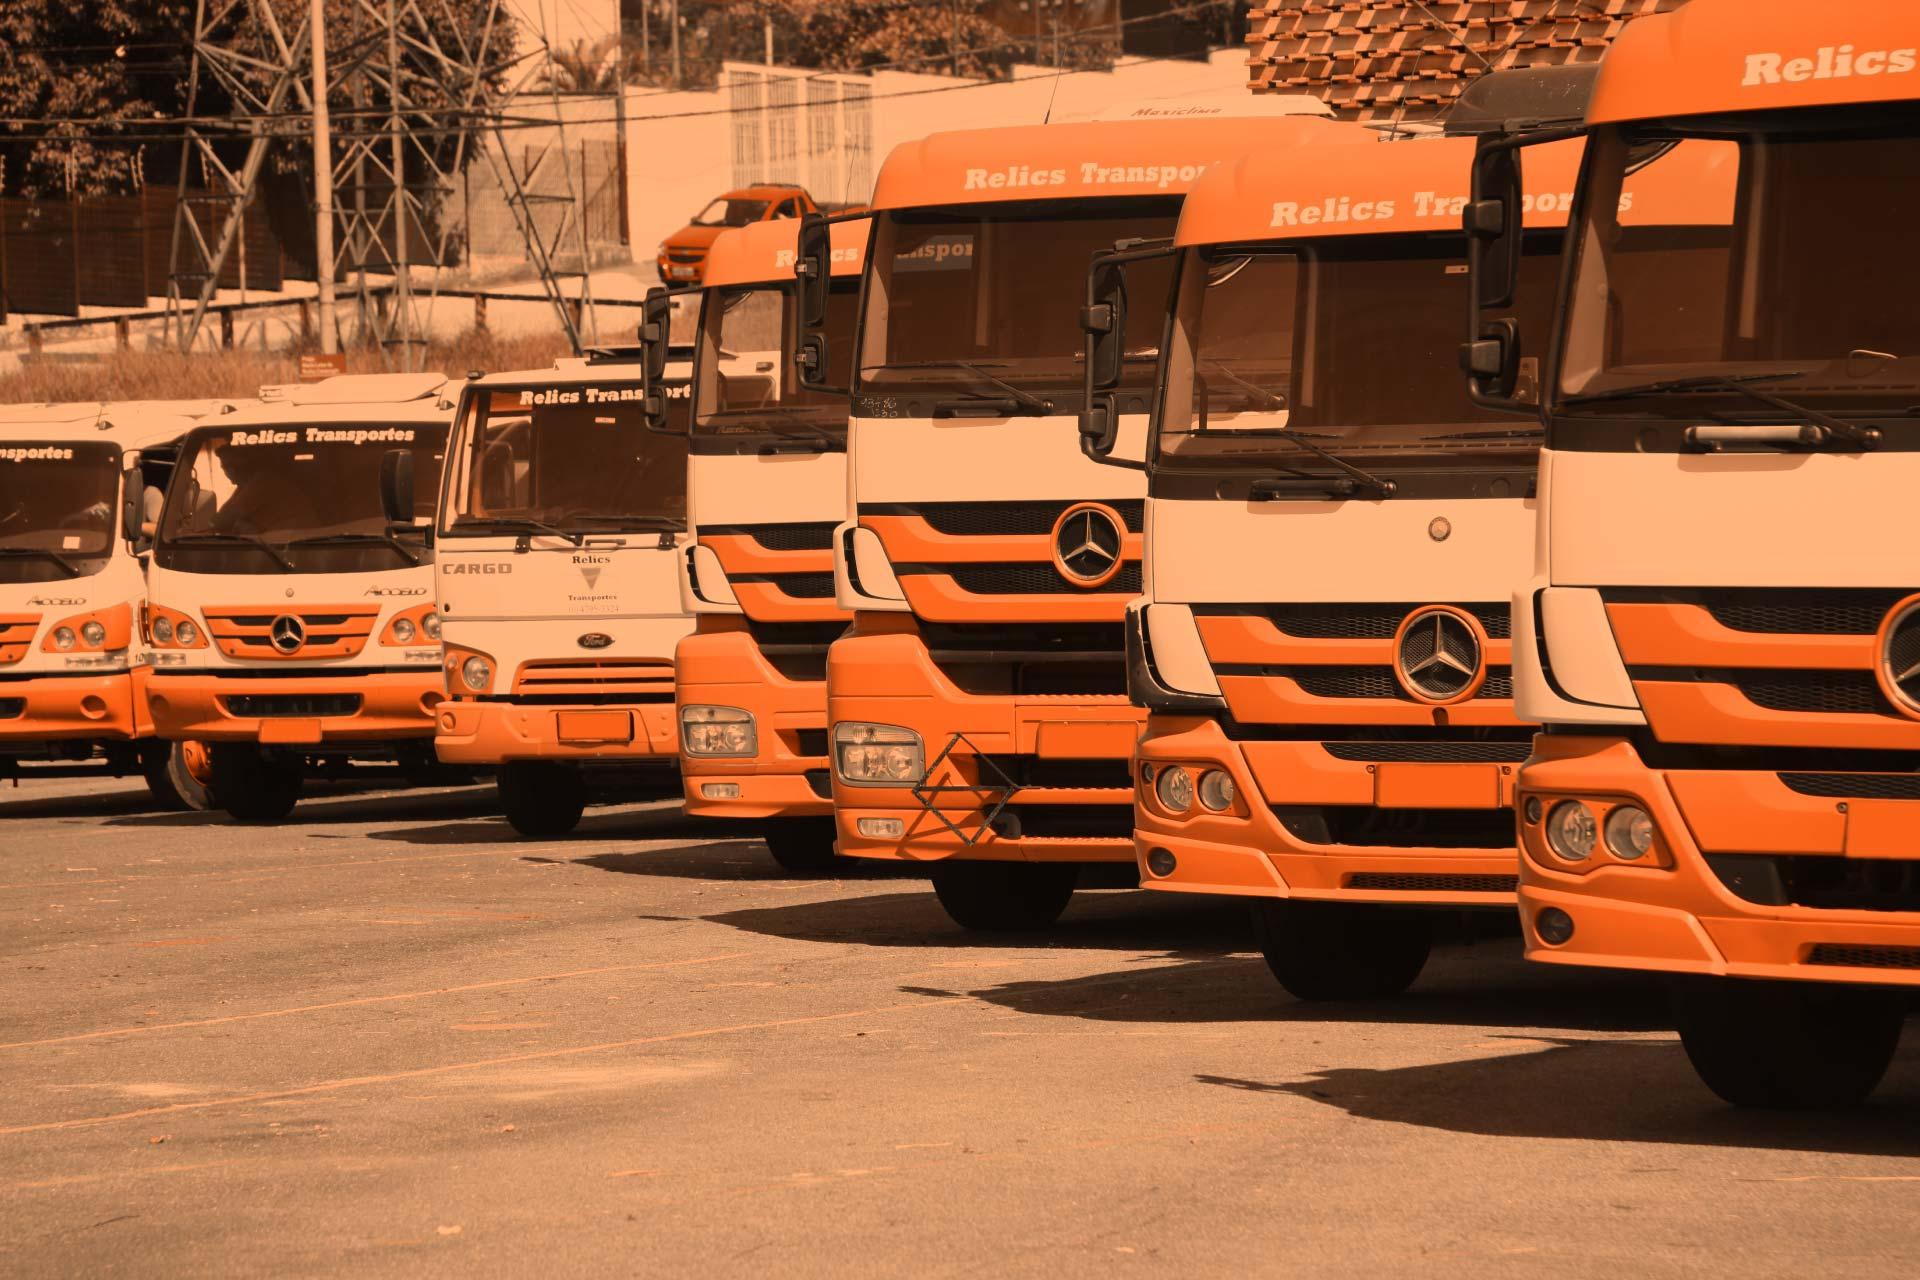 frota-relics-transportes